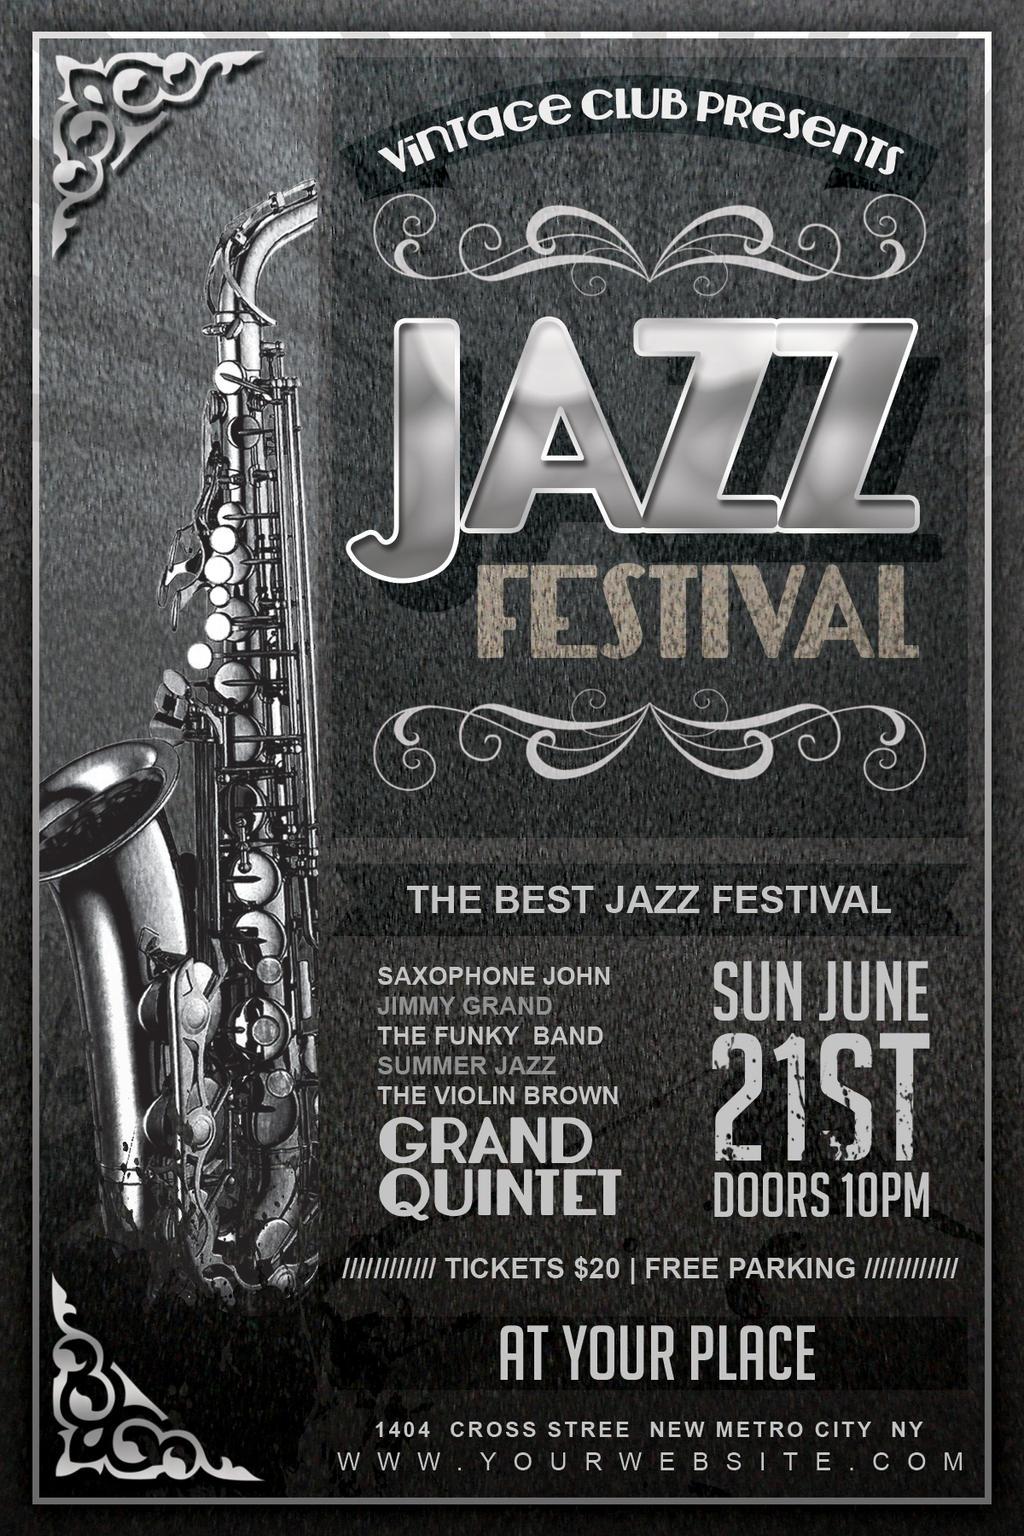 Vintage Jazz Festival Flyer by Dilanr on DeviantArt